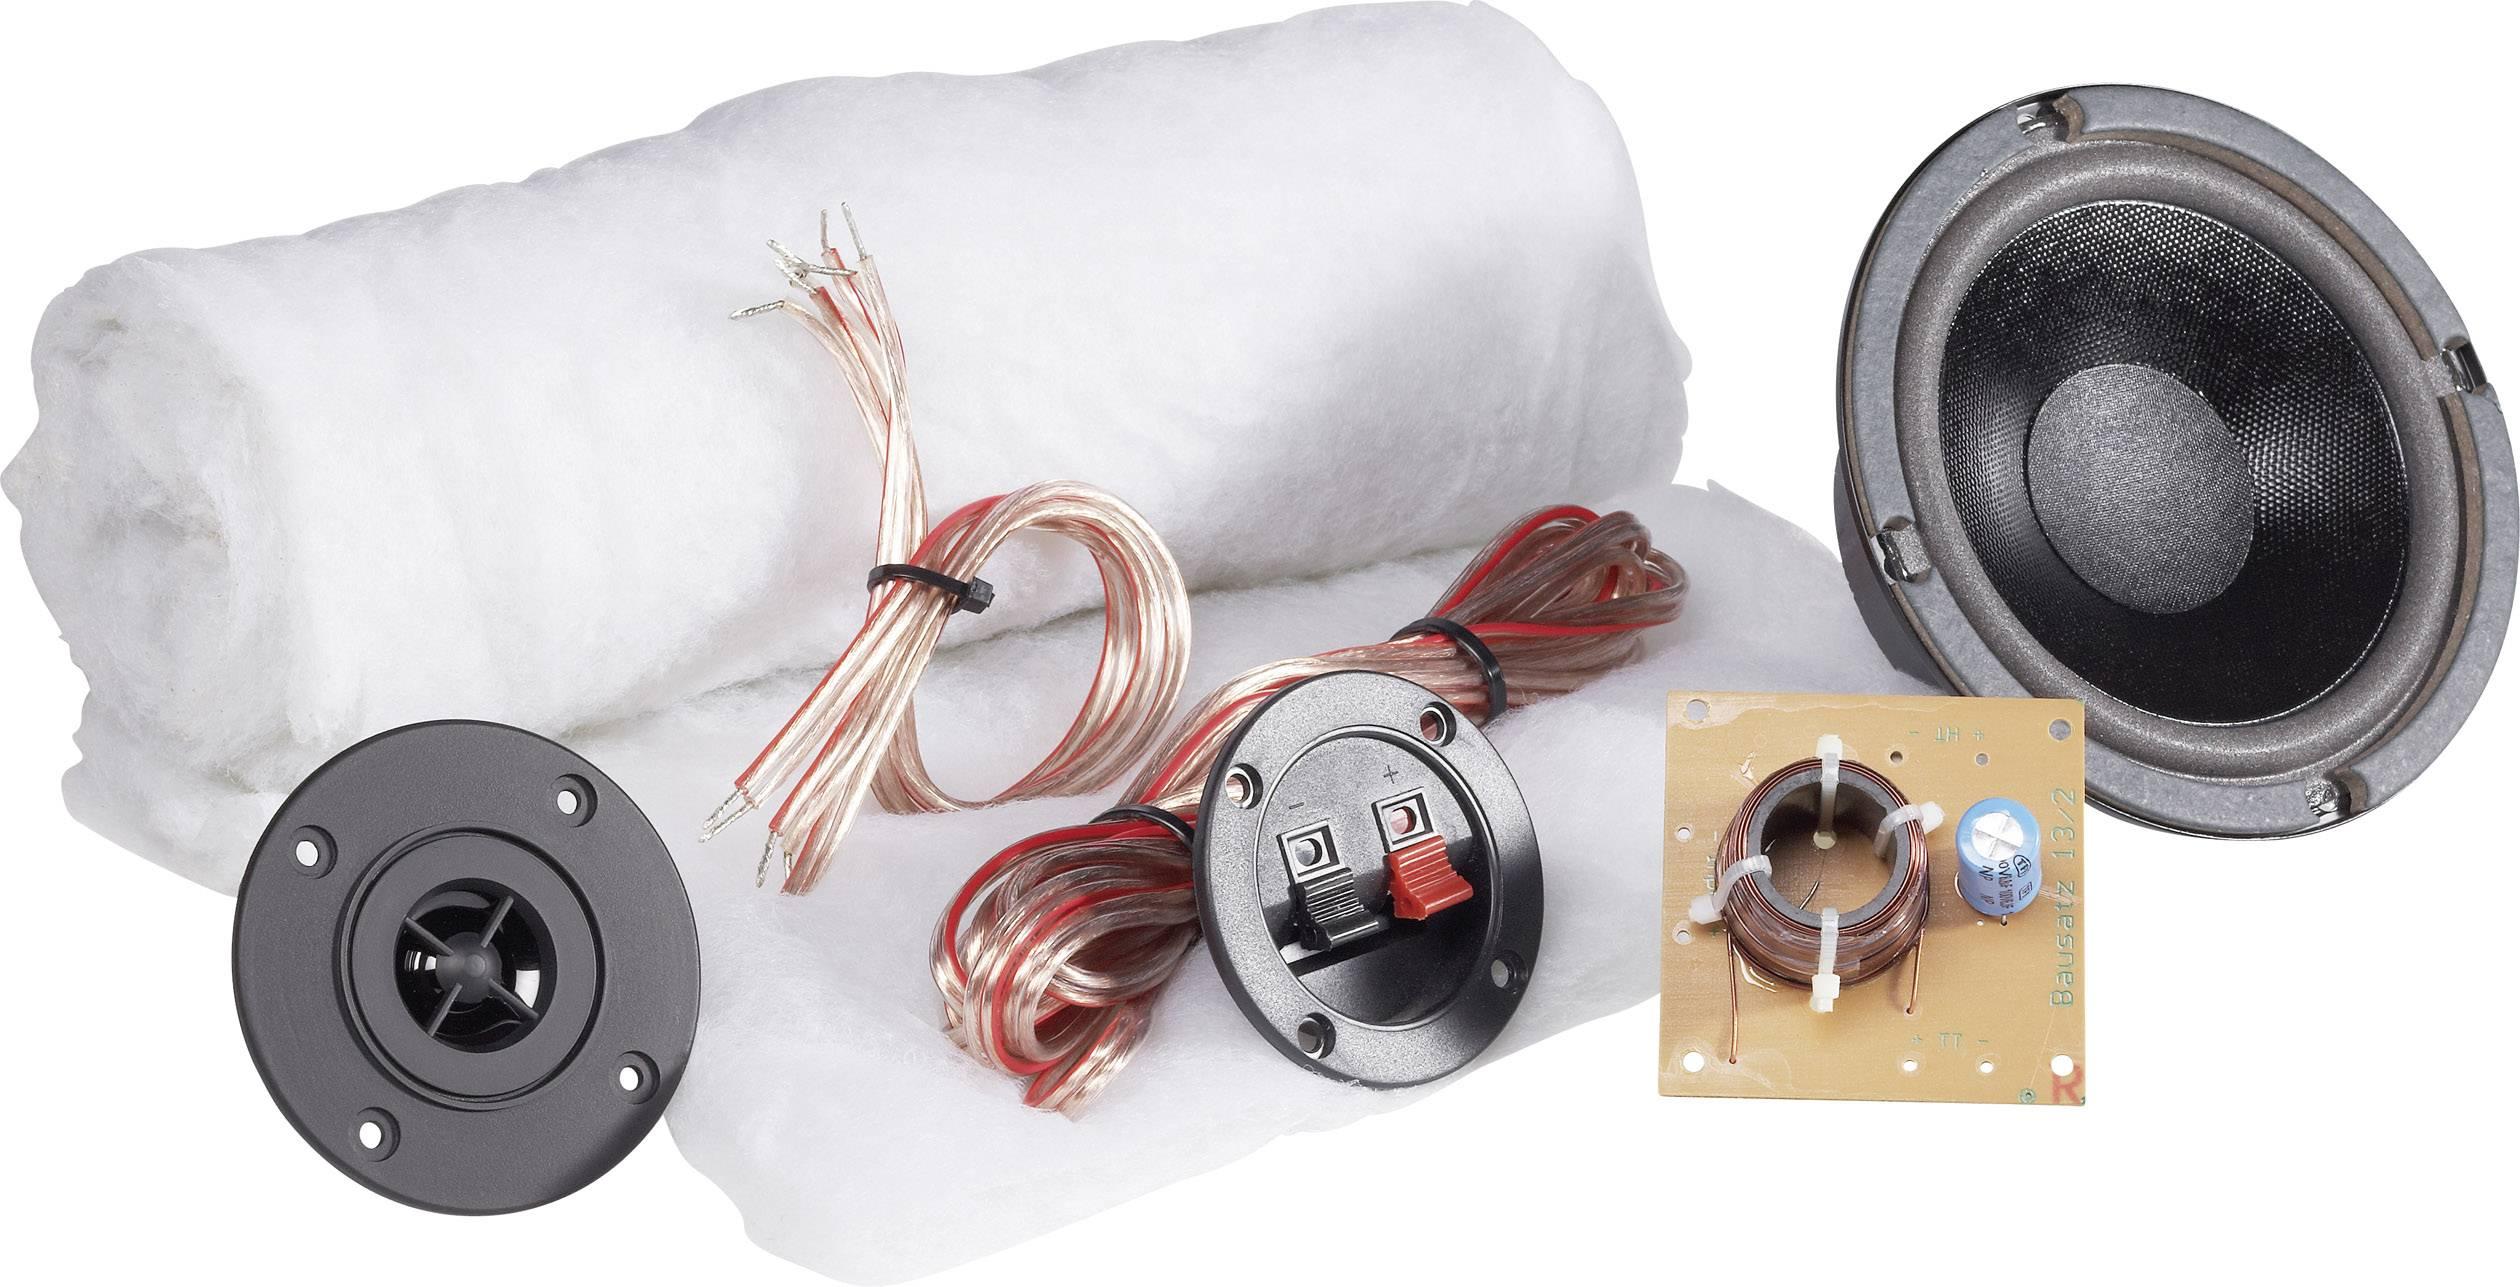 SpeaKa Professional Kit 1 2-way speaker assembly kit incl